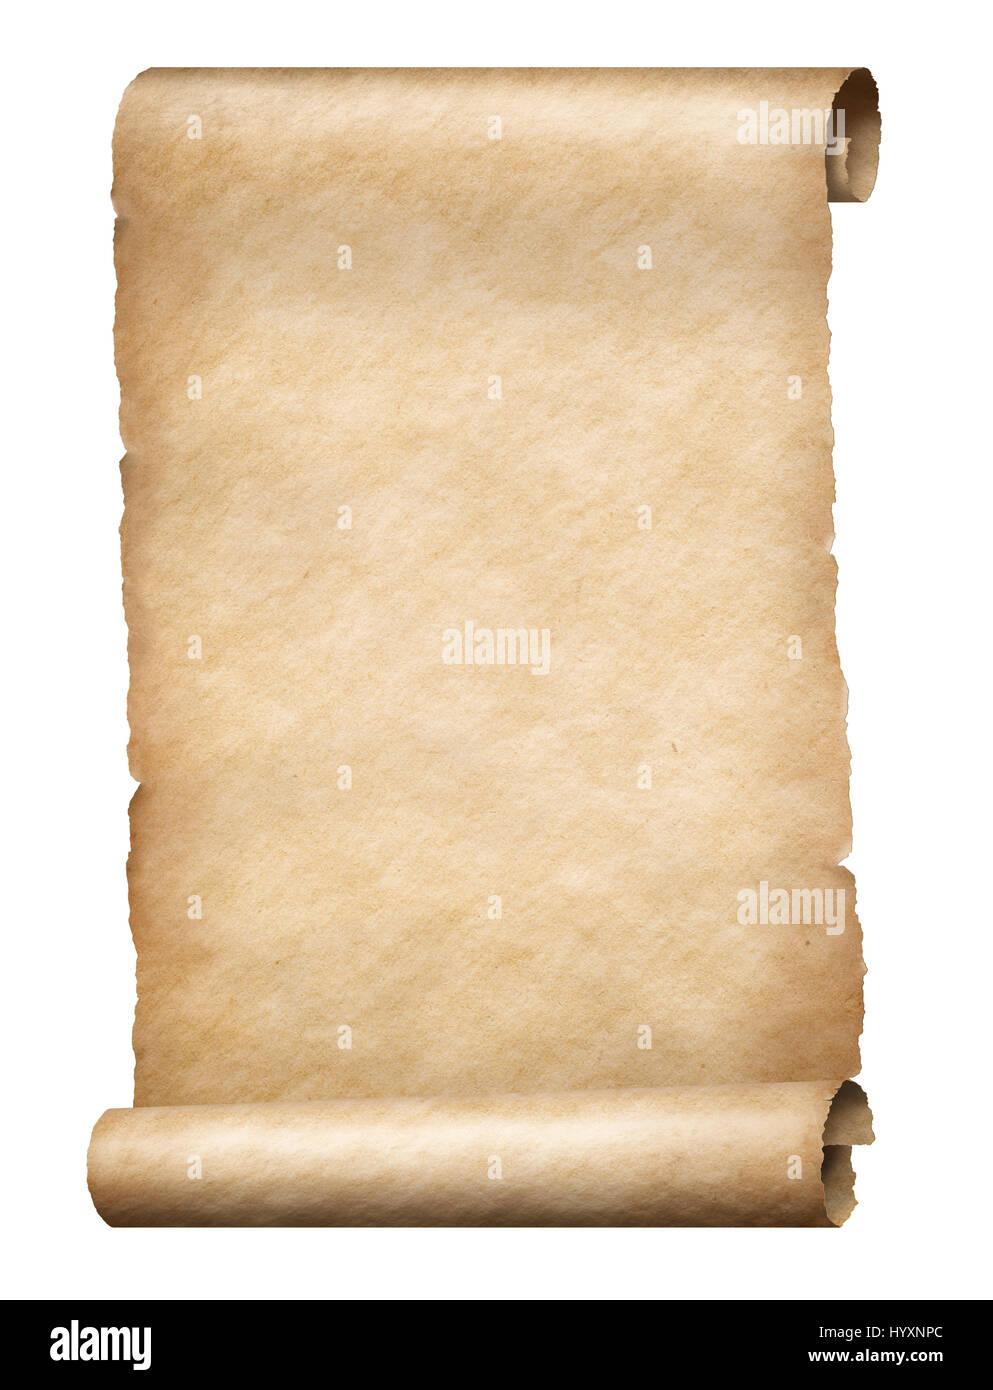 parchment scroll stock photo 137656132 alamy